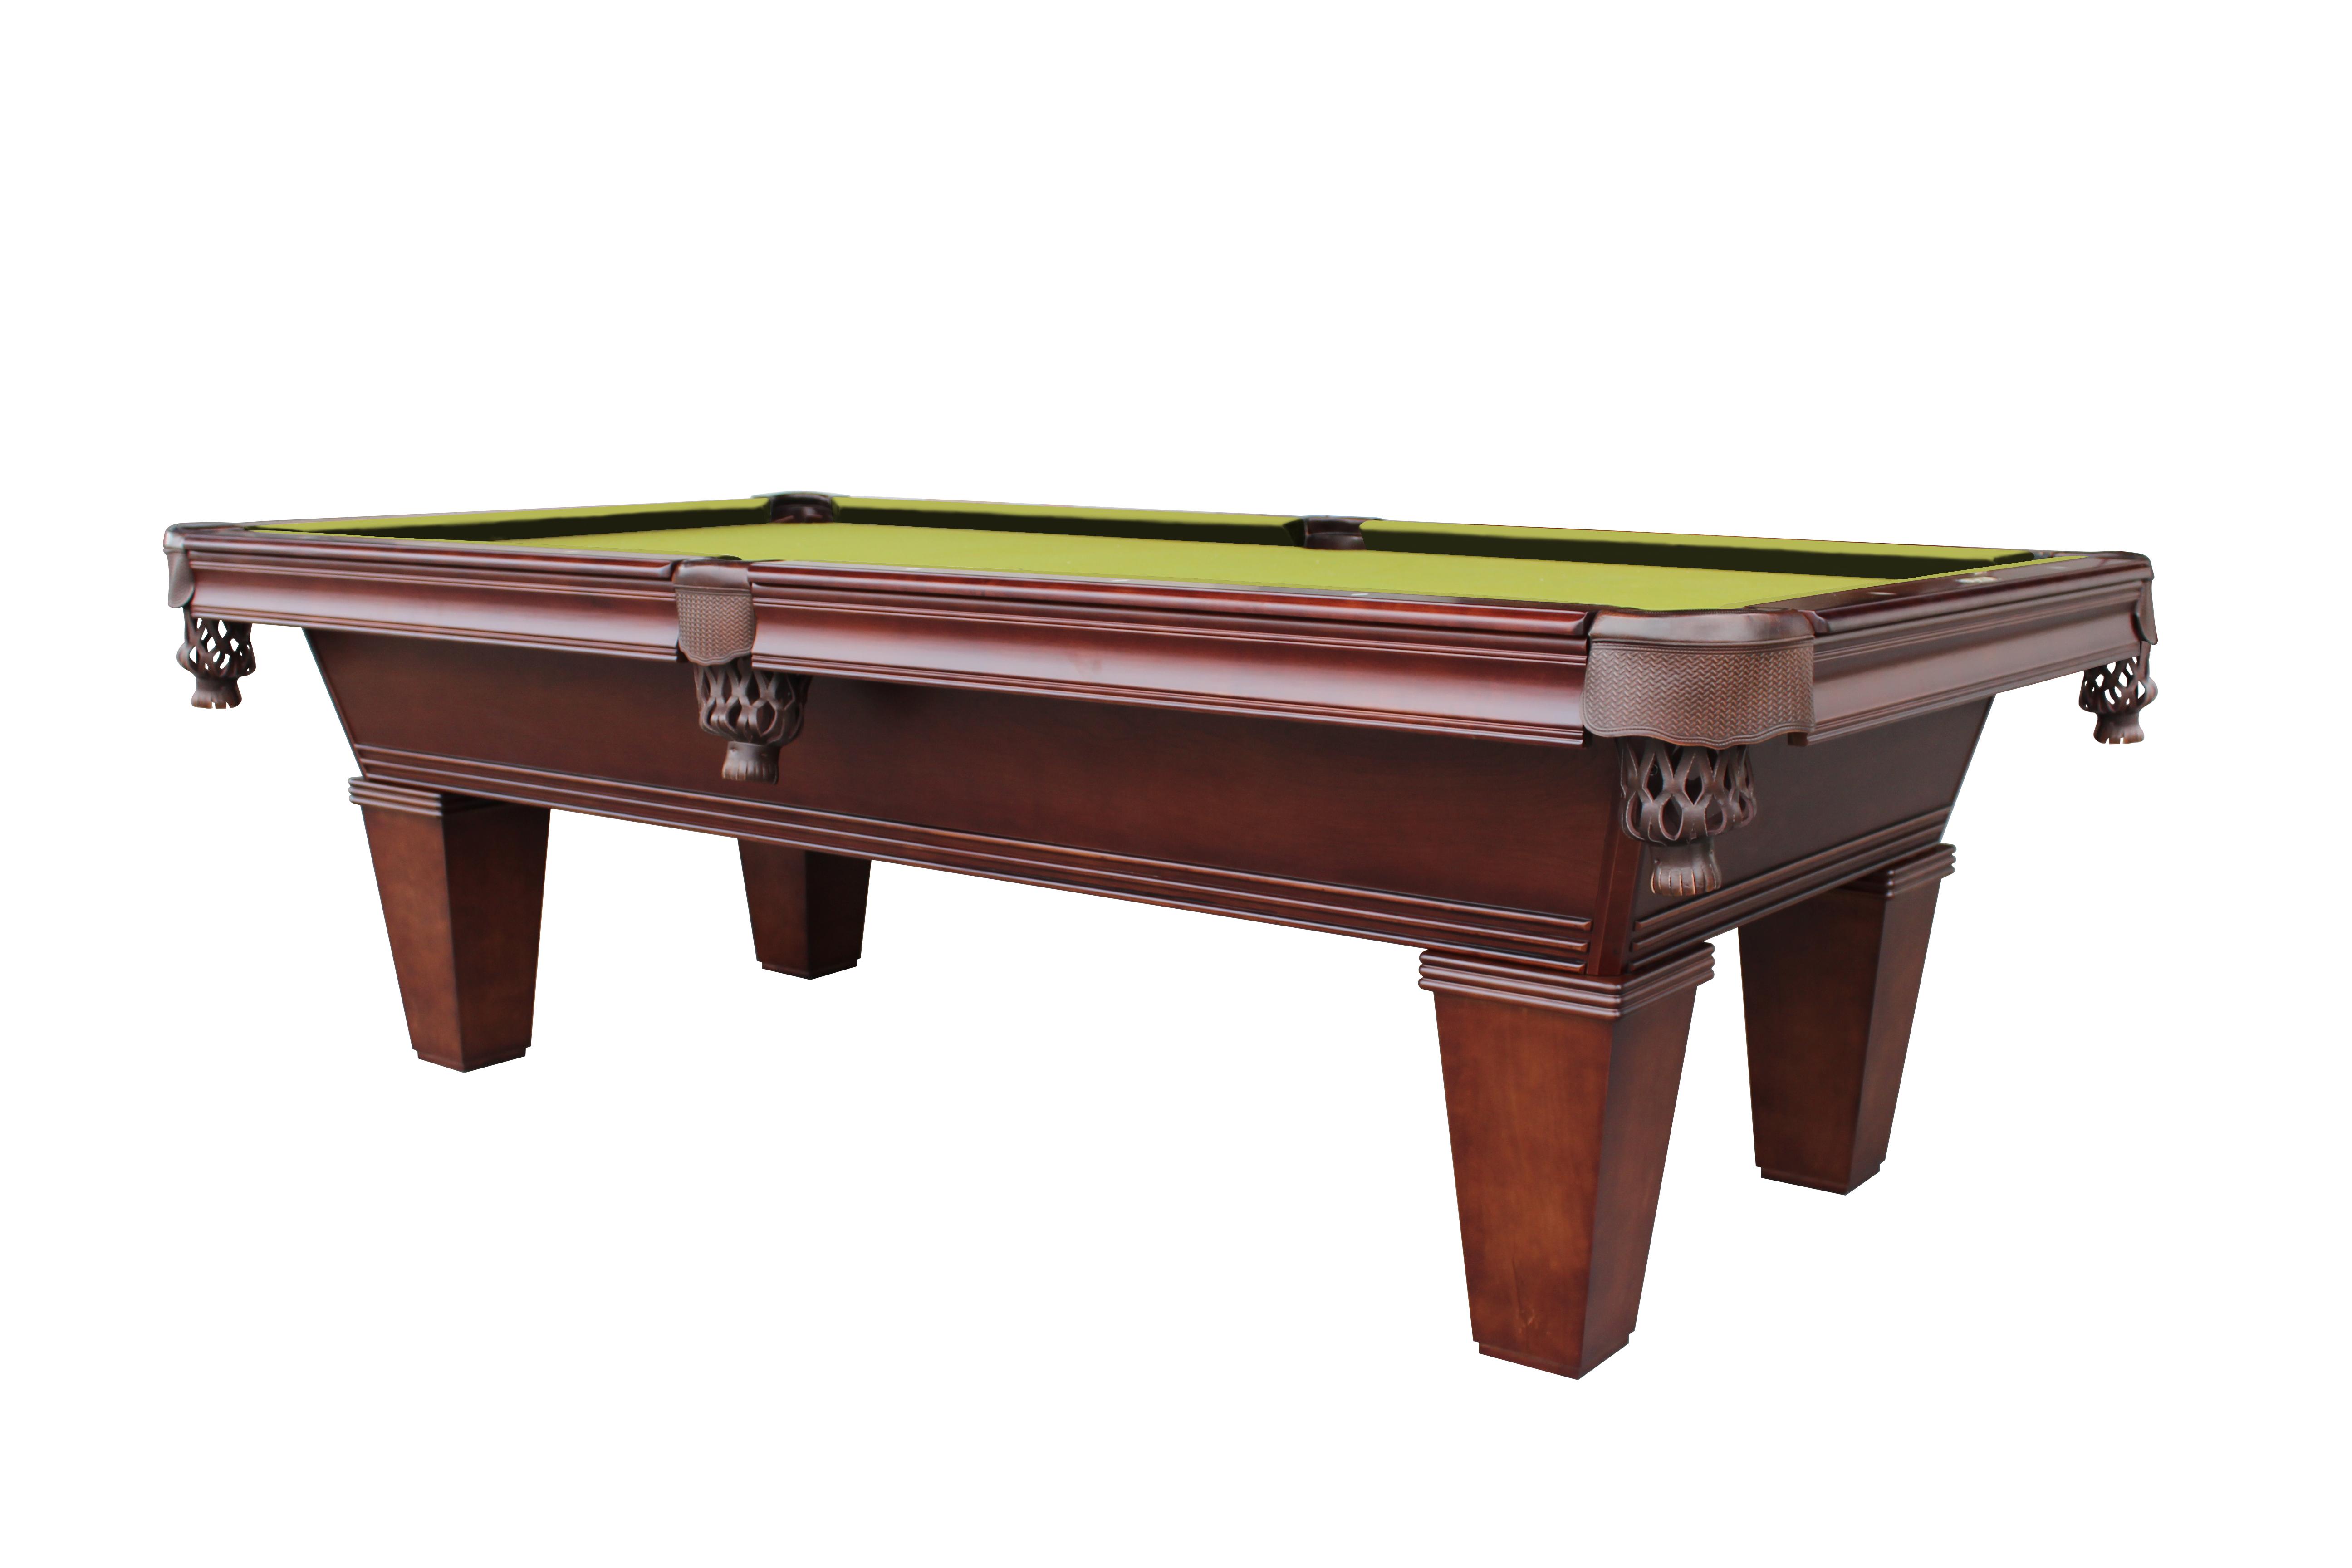 Cascadia slate pool table